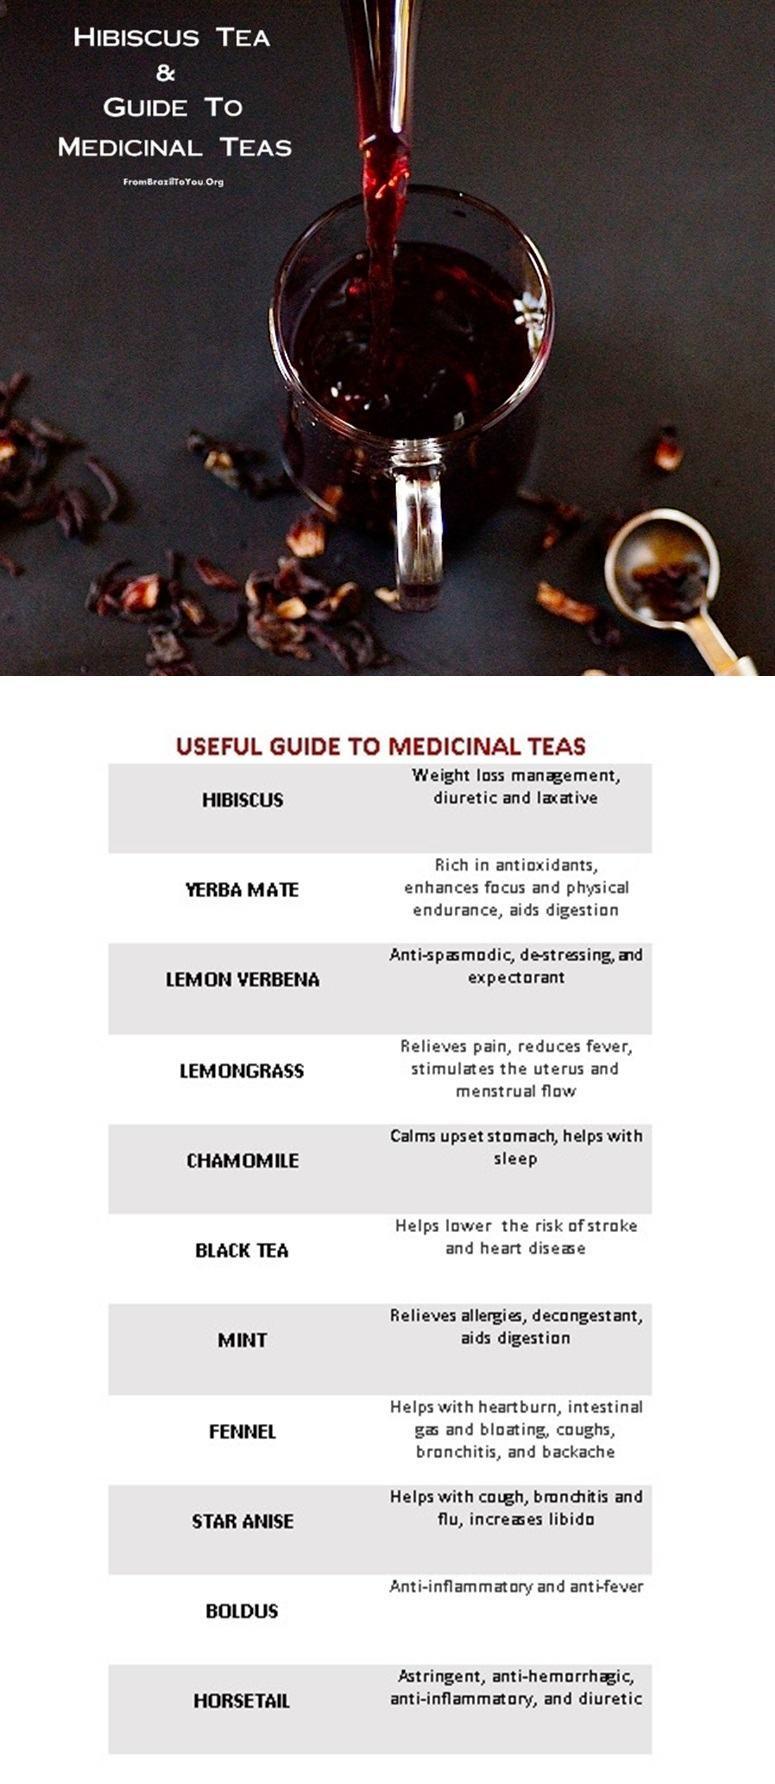 hibiscus-tea, guide-medicinal-teas